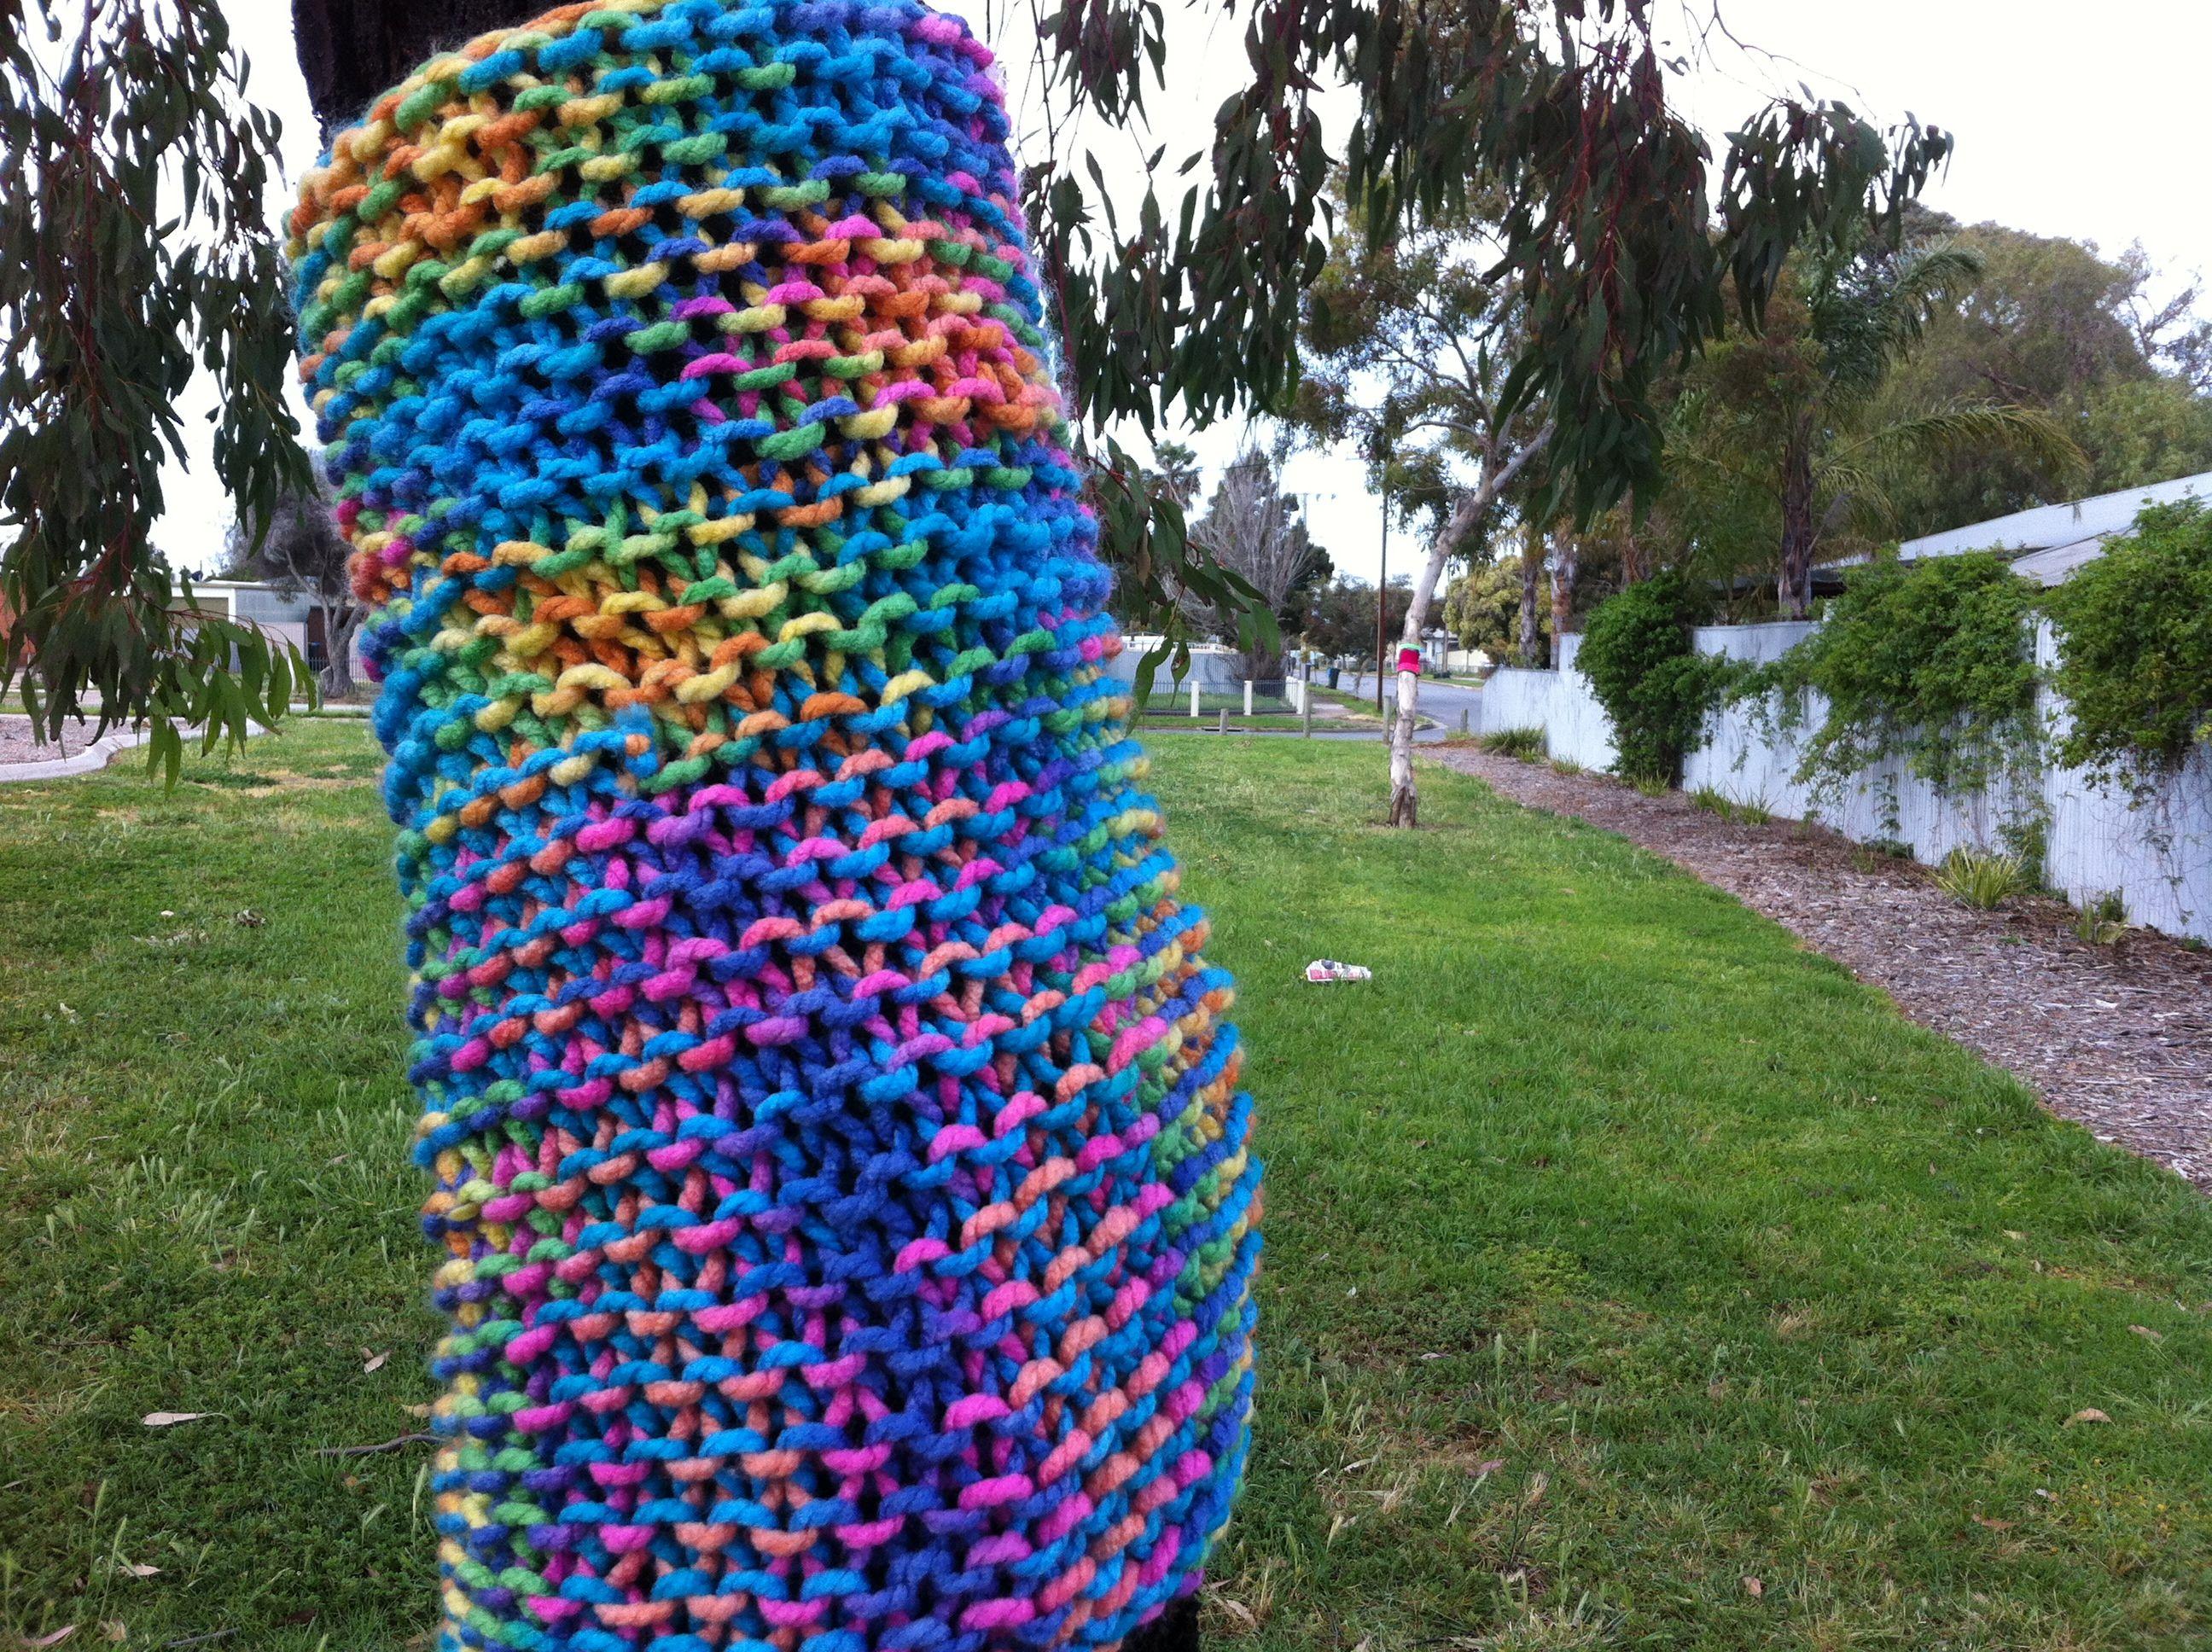 Knitting Trees Art : Yarn bombing a ball of can create dreams